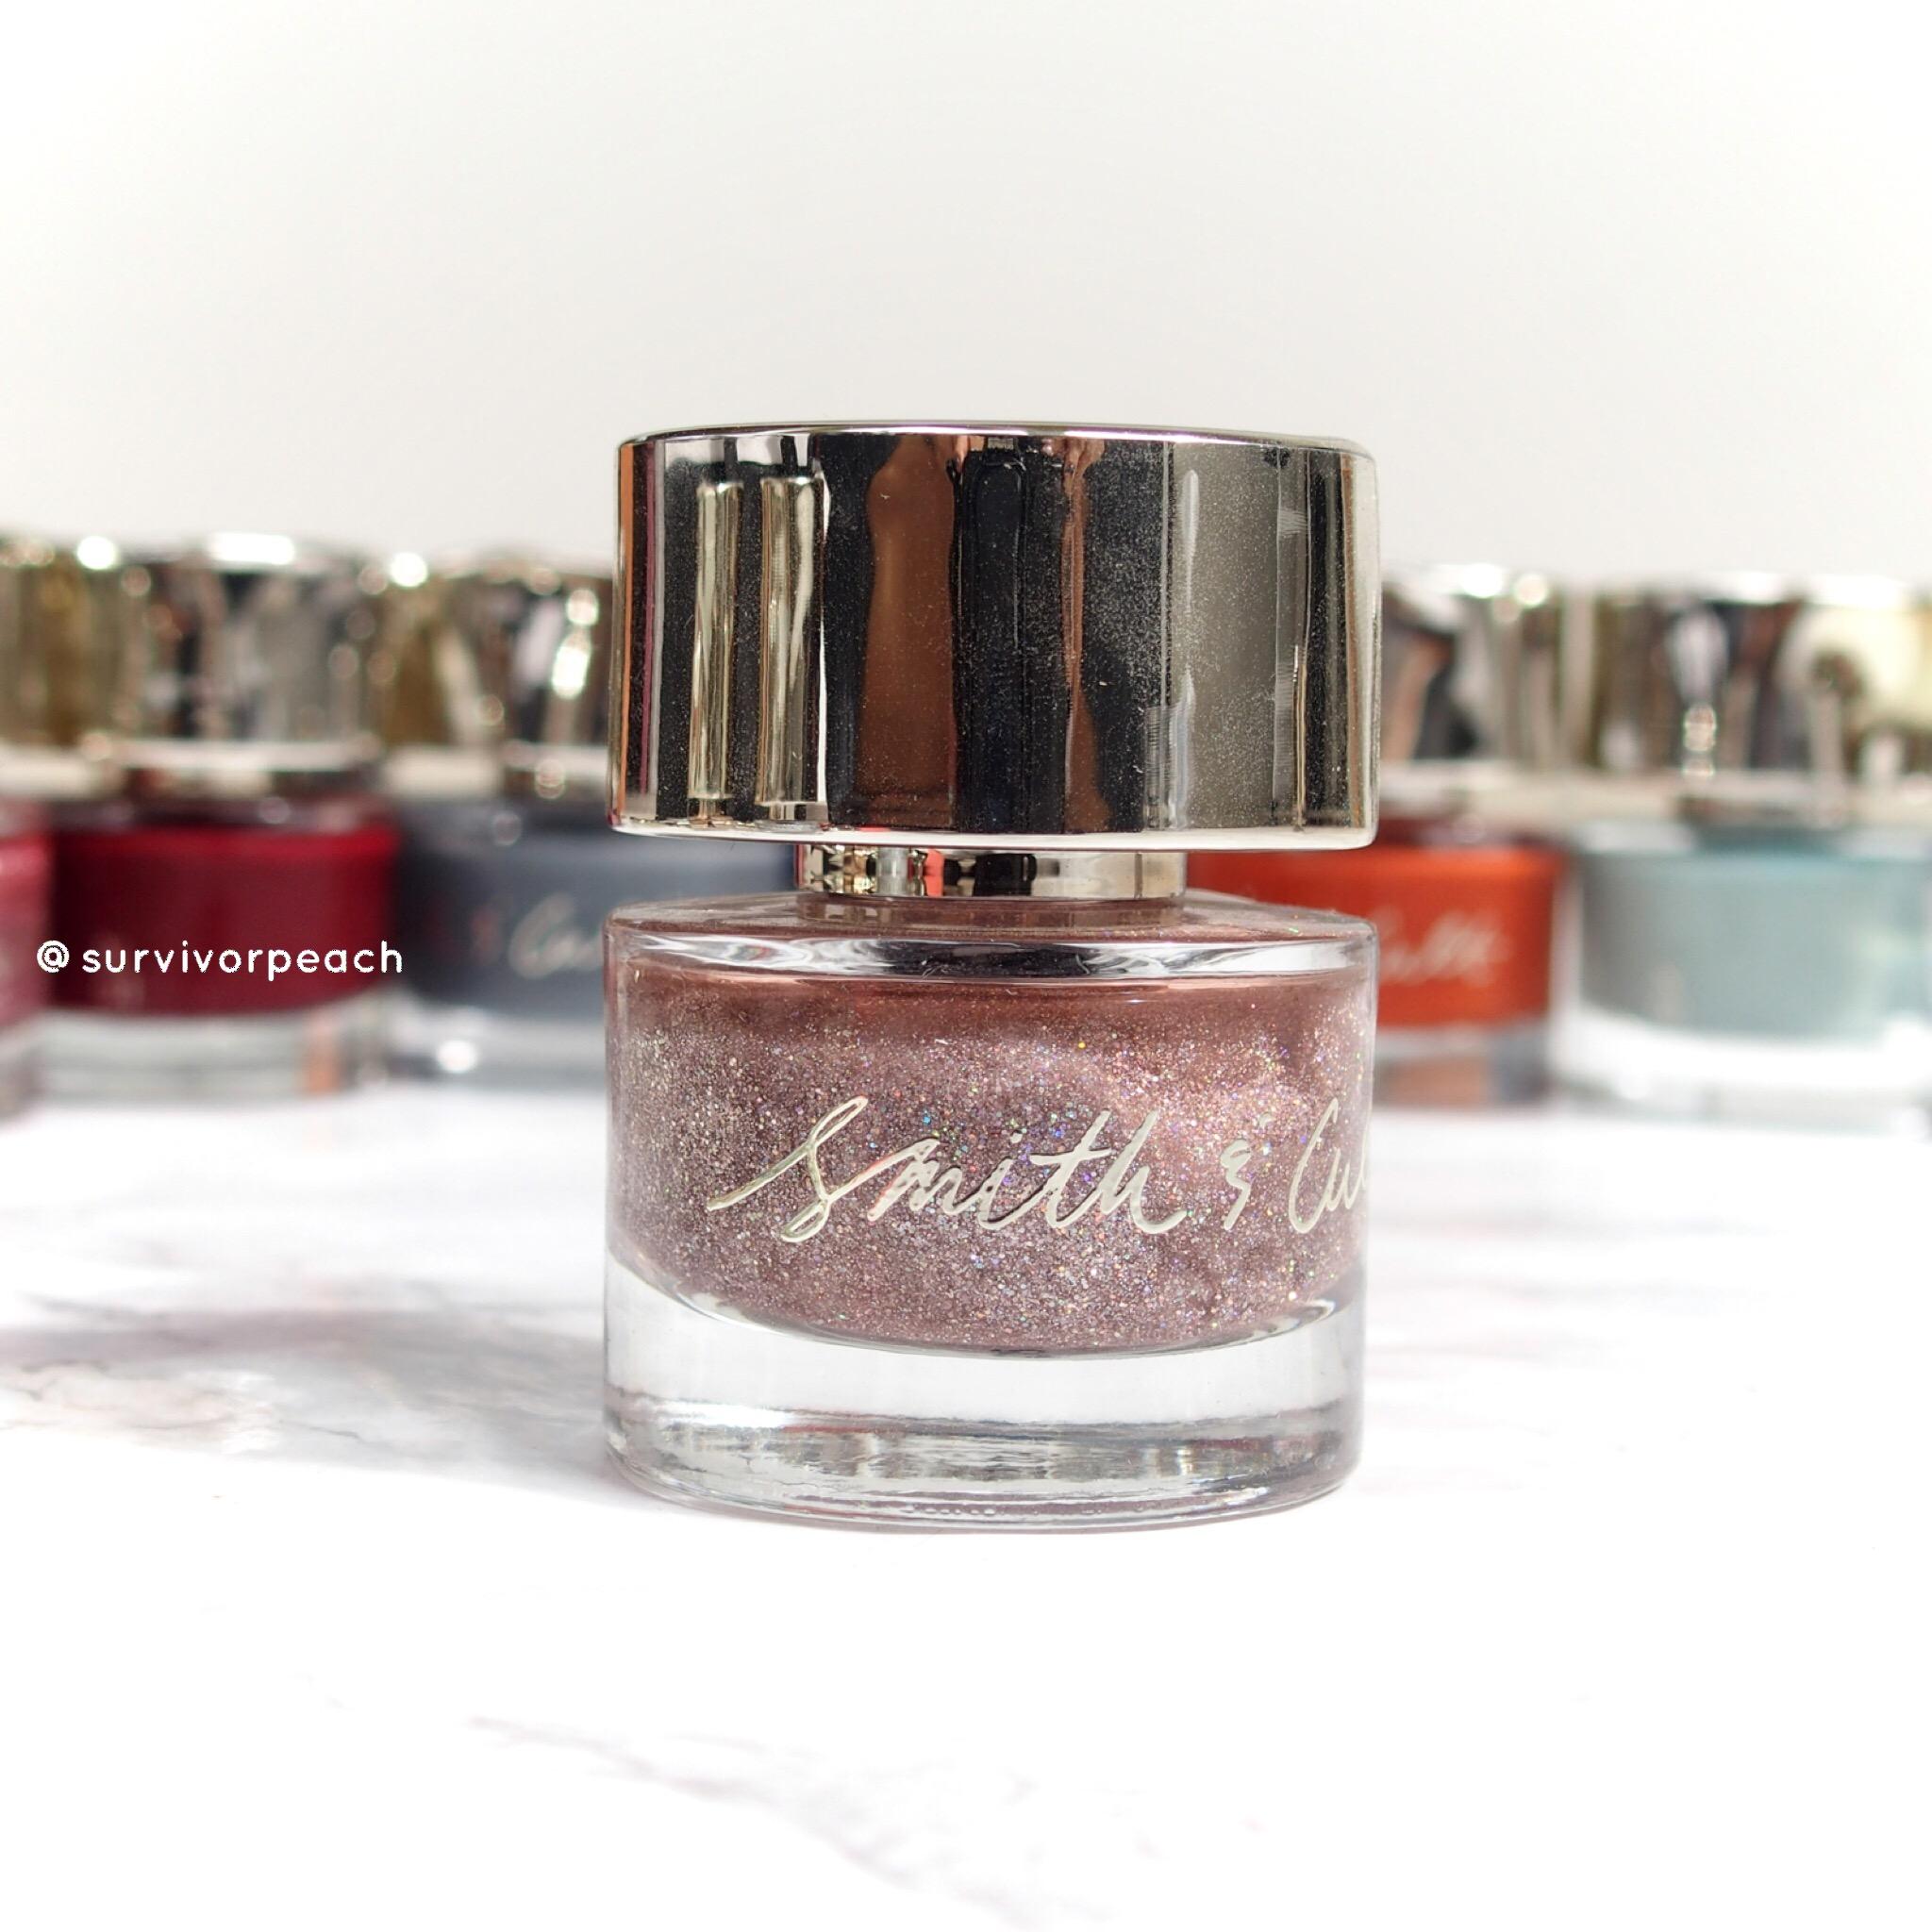 Smith & Cult Nail Polish in Take Fountain